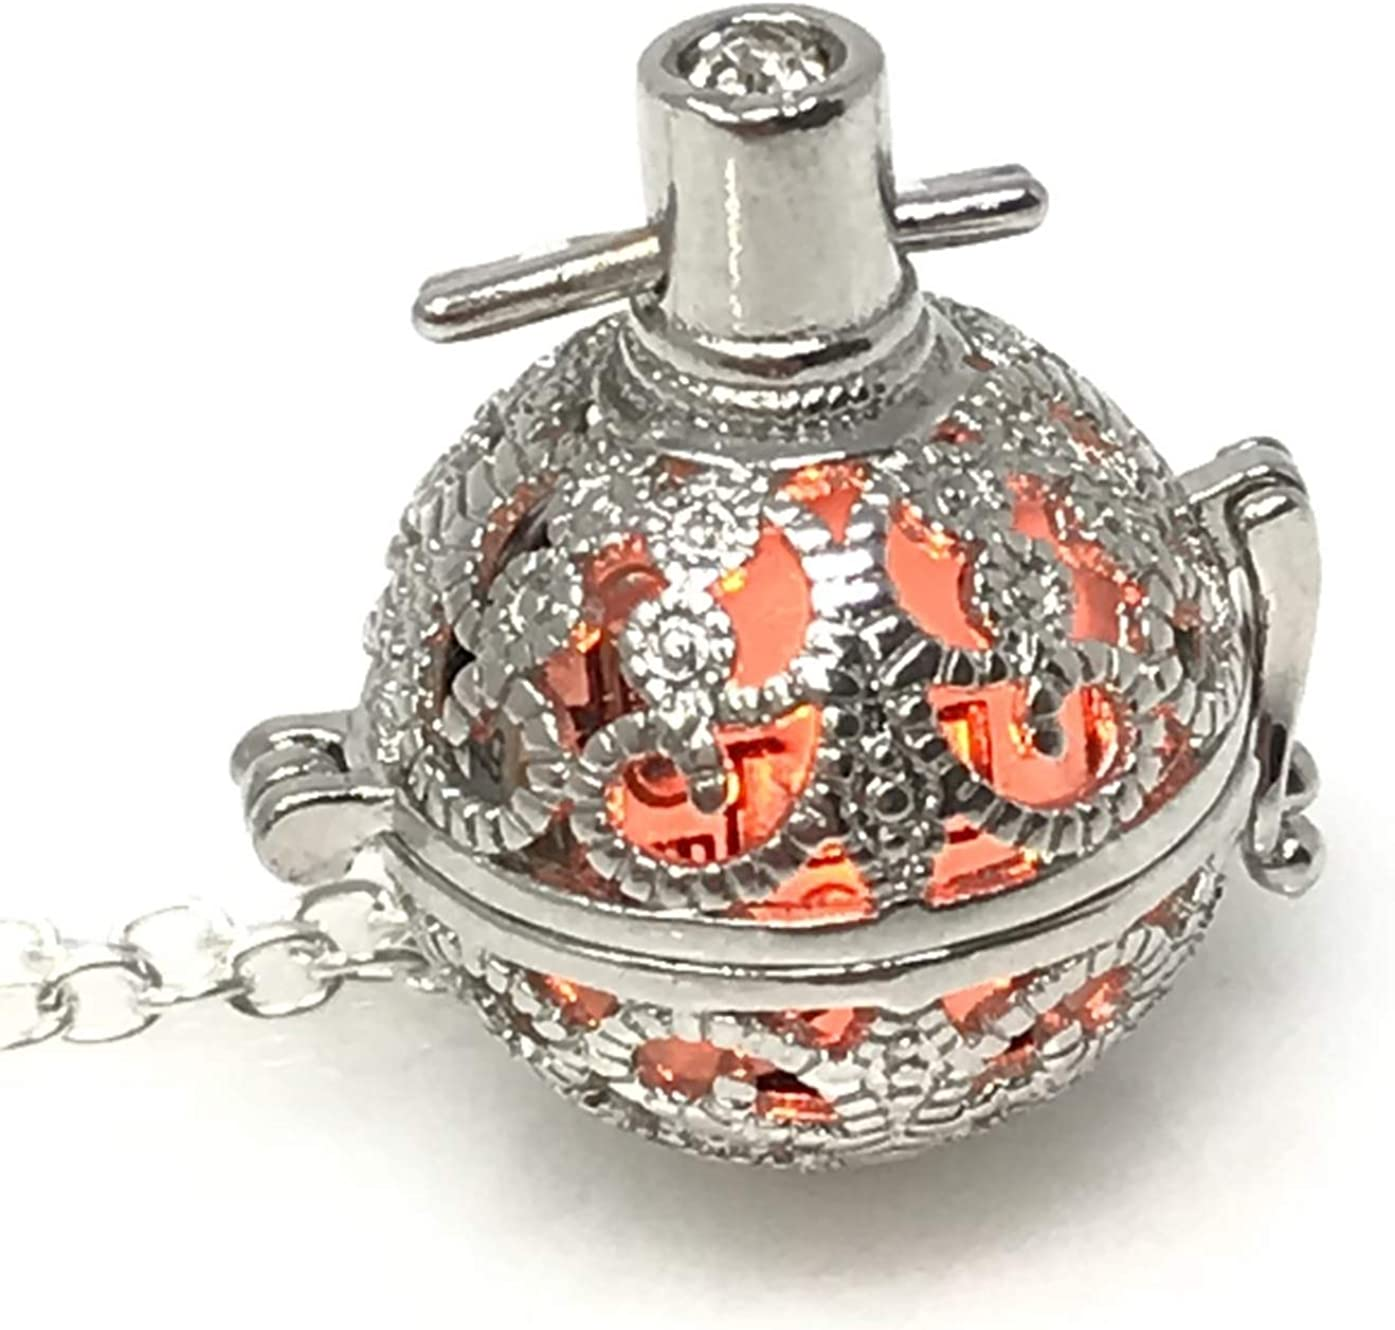 UMBRELLALABORATORY Steampunk FIRE Necklace - Pendant Max 72% OFF Glow Locket sale